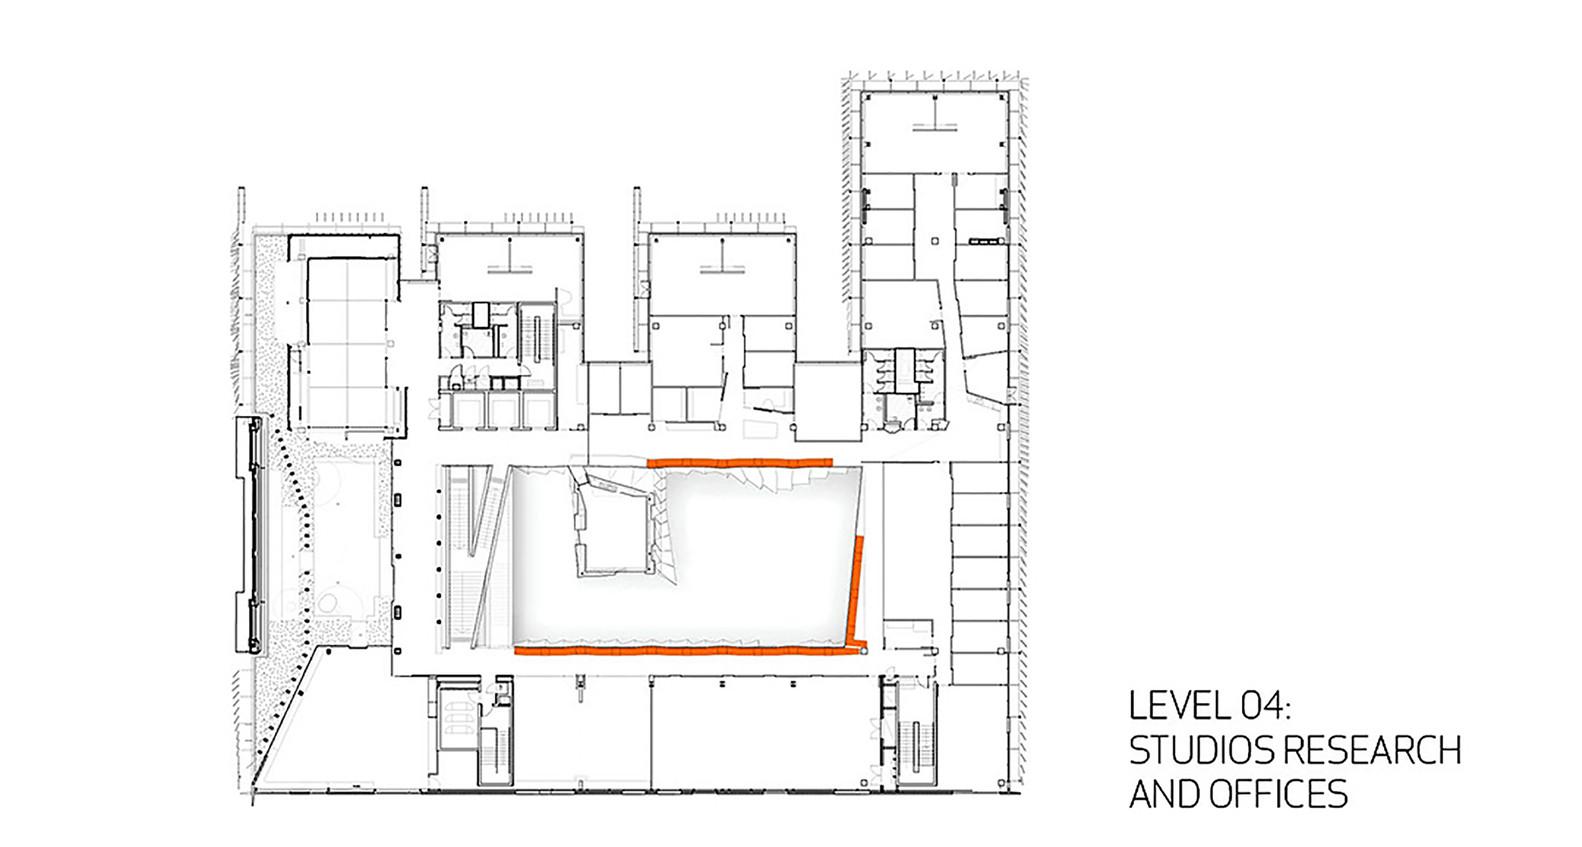 Melbourne school of design university of melbournefourth floor plan